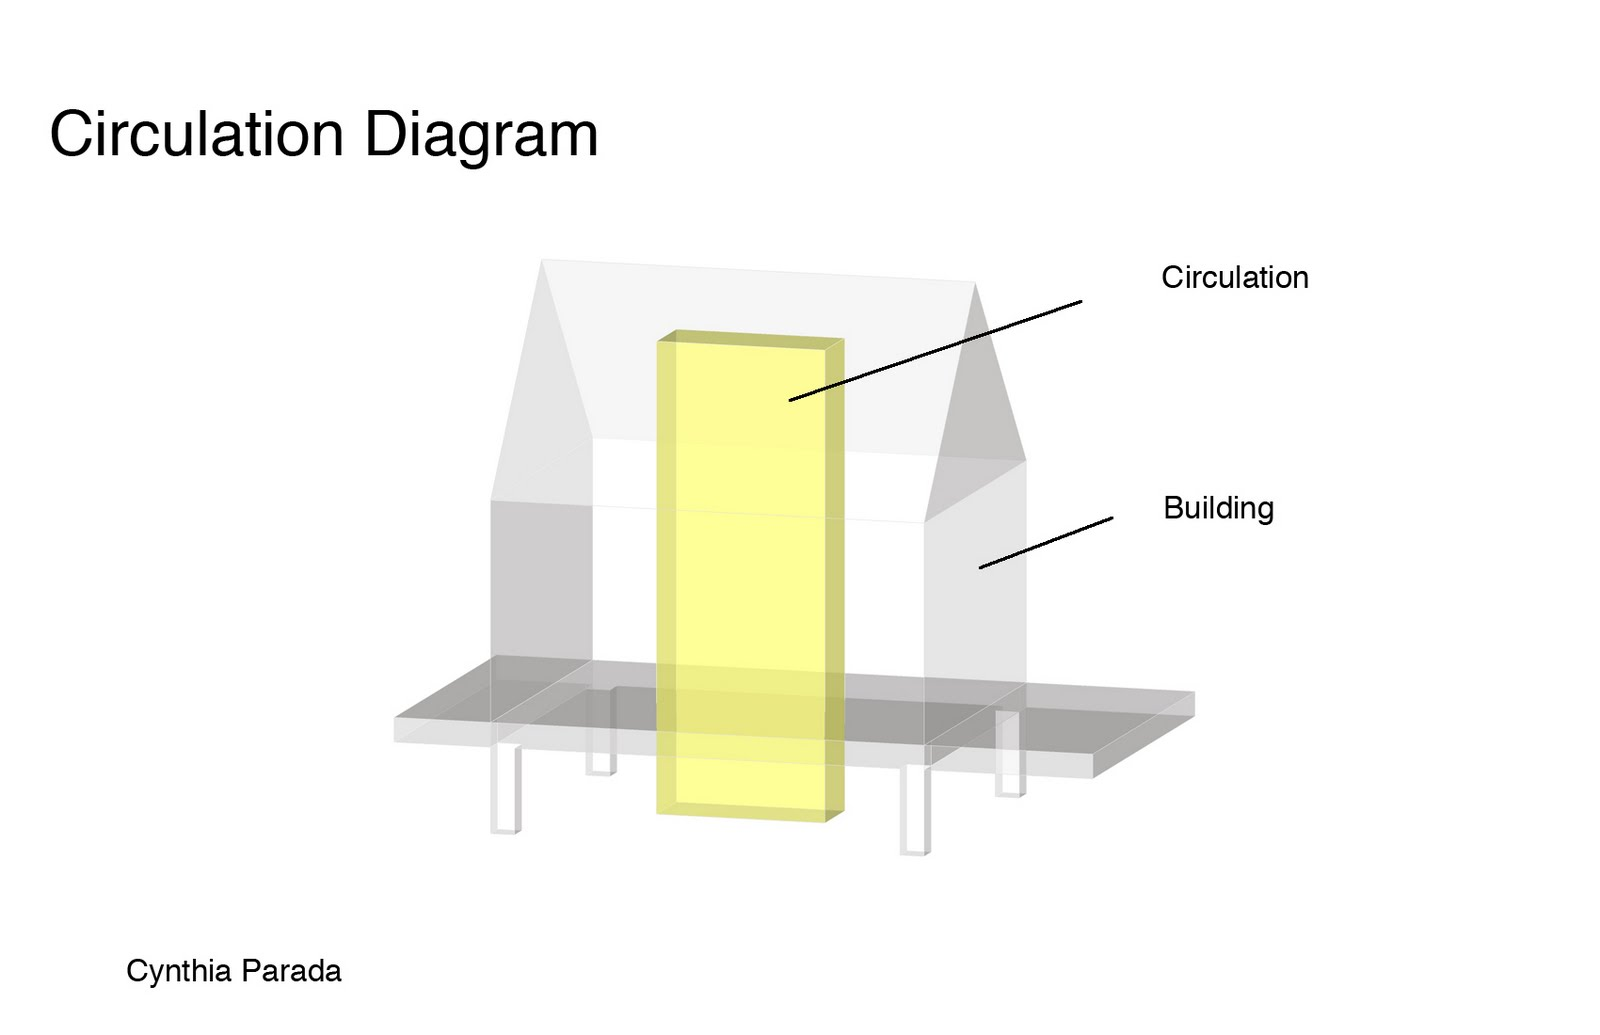 ARC 4058 Fall 2011: Cynthia Parada Rudin House Diagrams